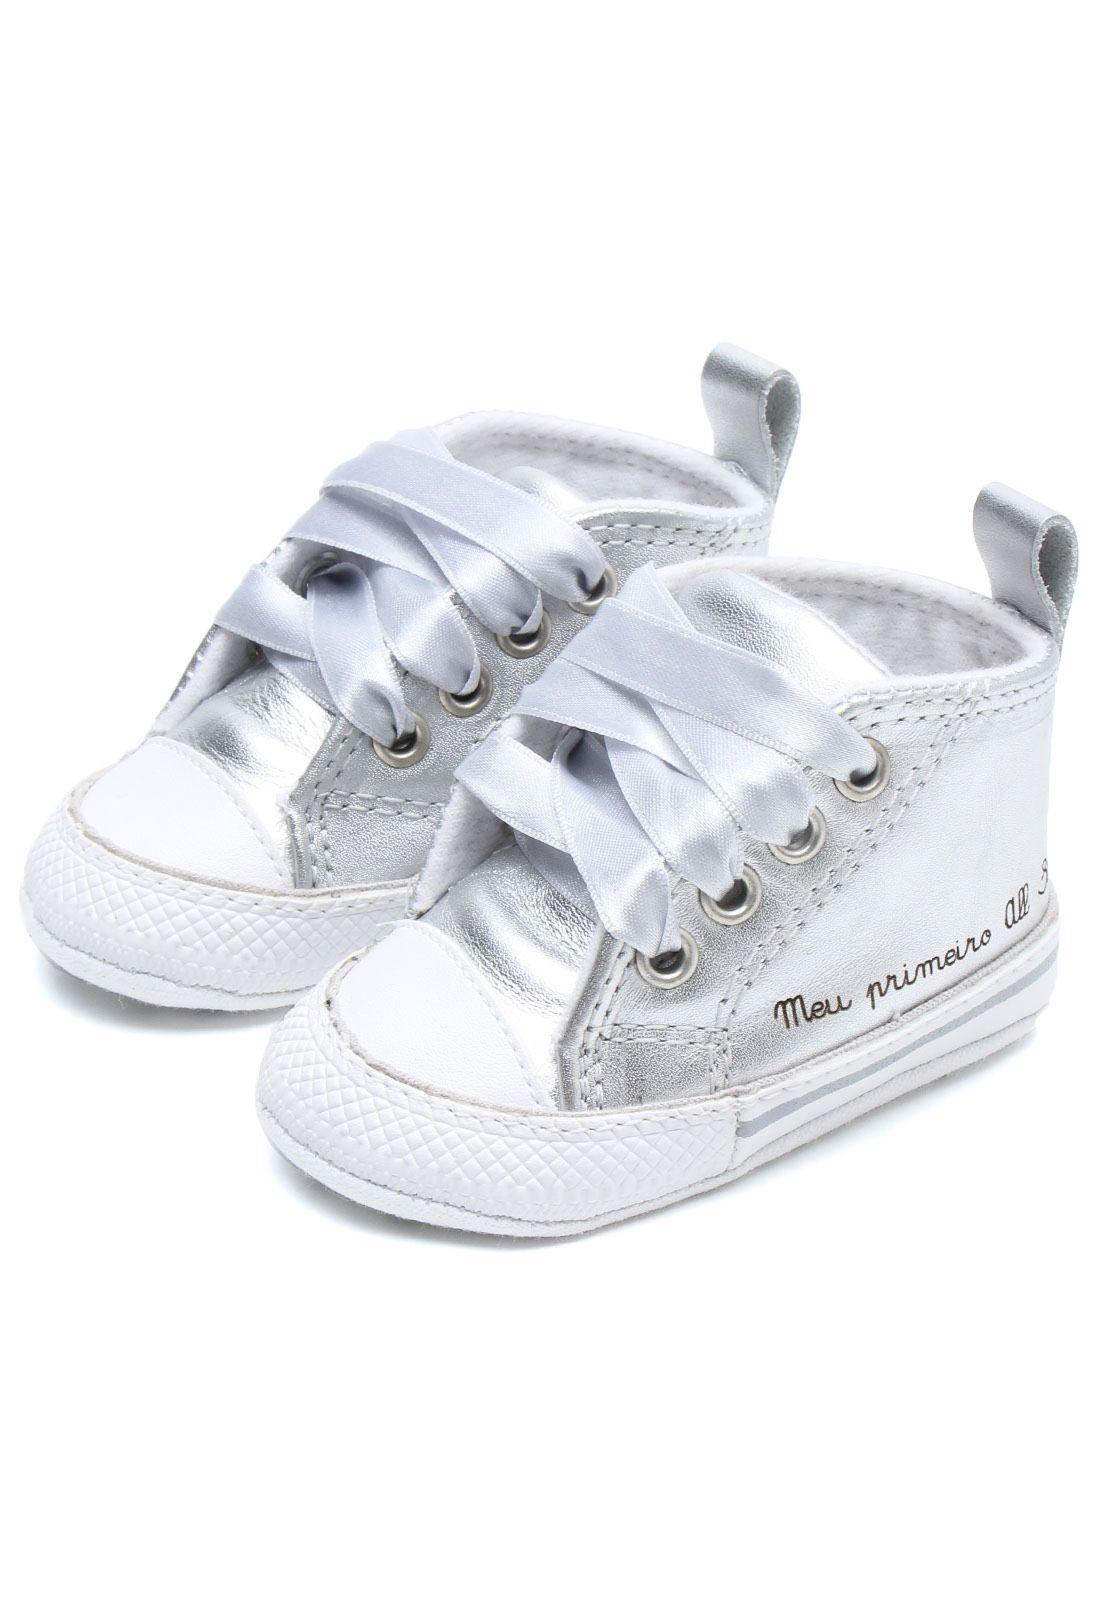 Tênis Converse Chuck Taylor All Star Prata - Marca Converse  bbe662b139864